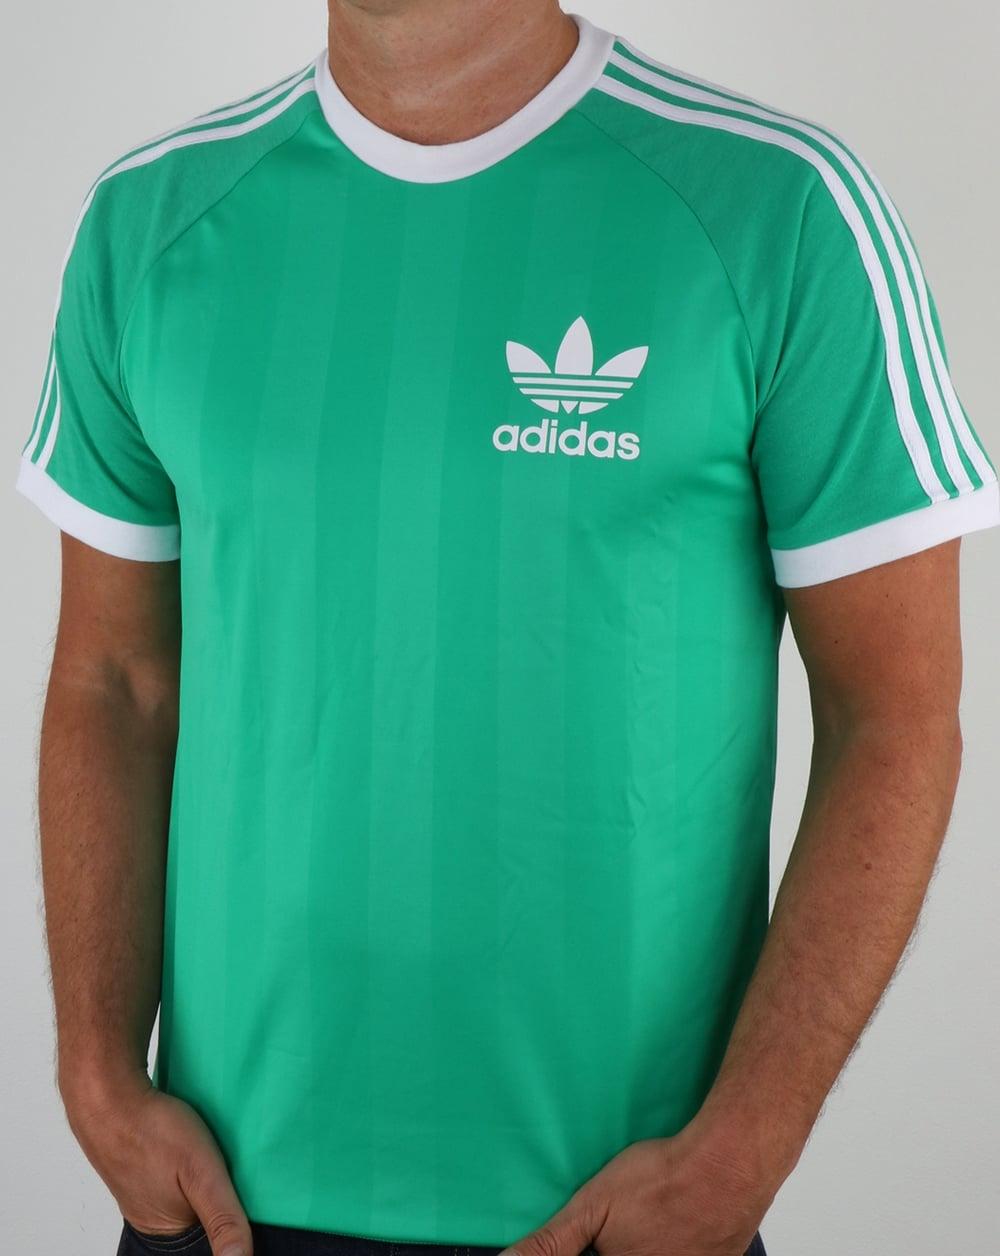 green adidas shirt